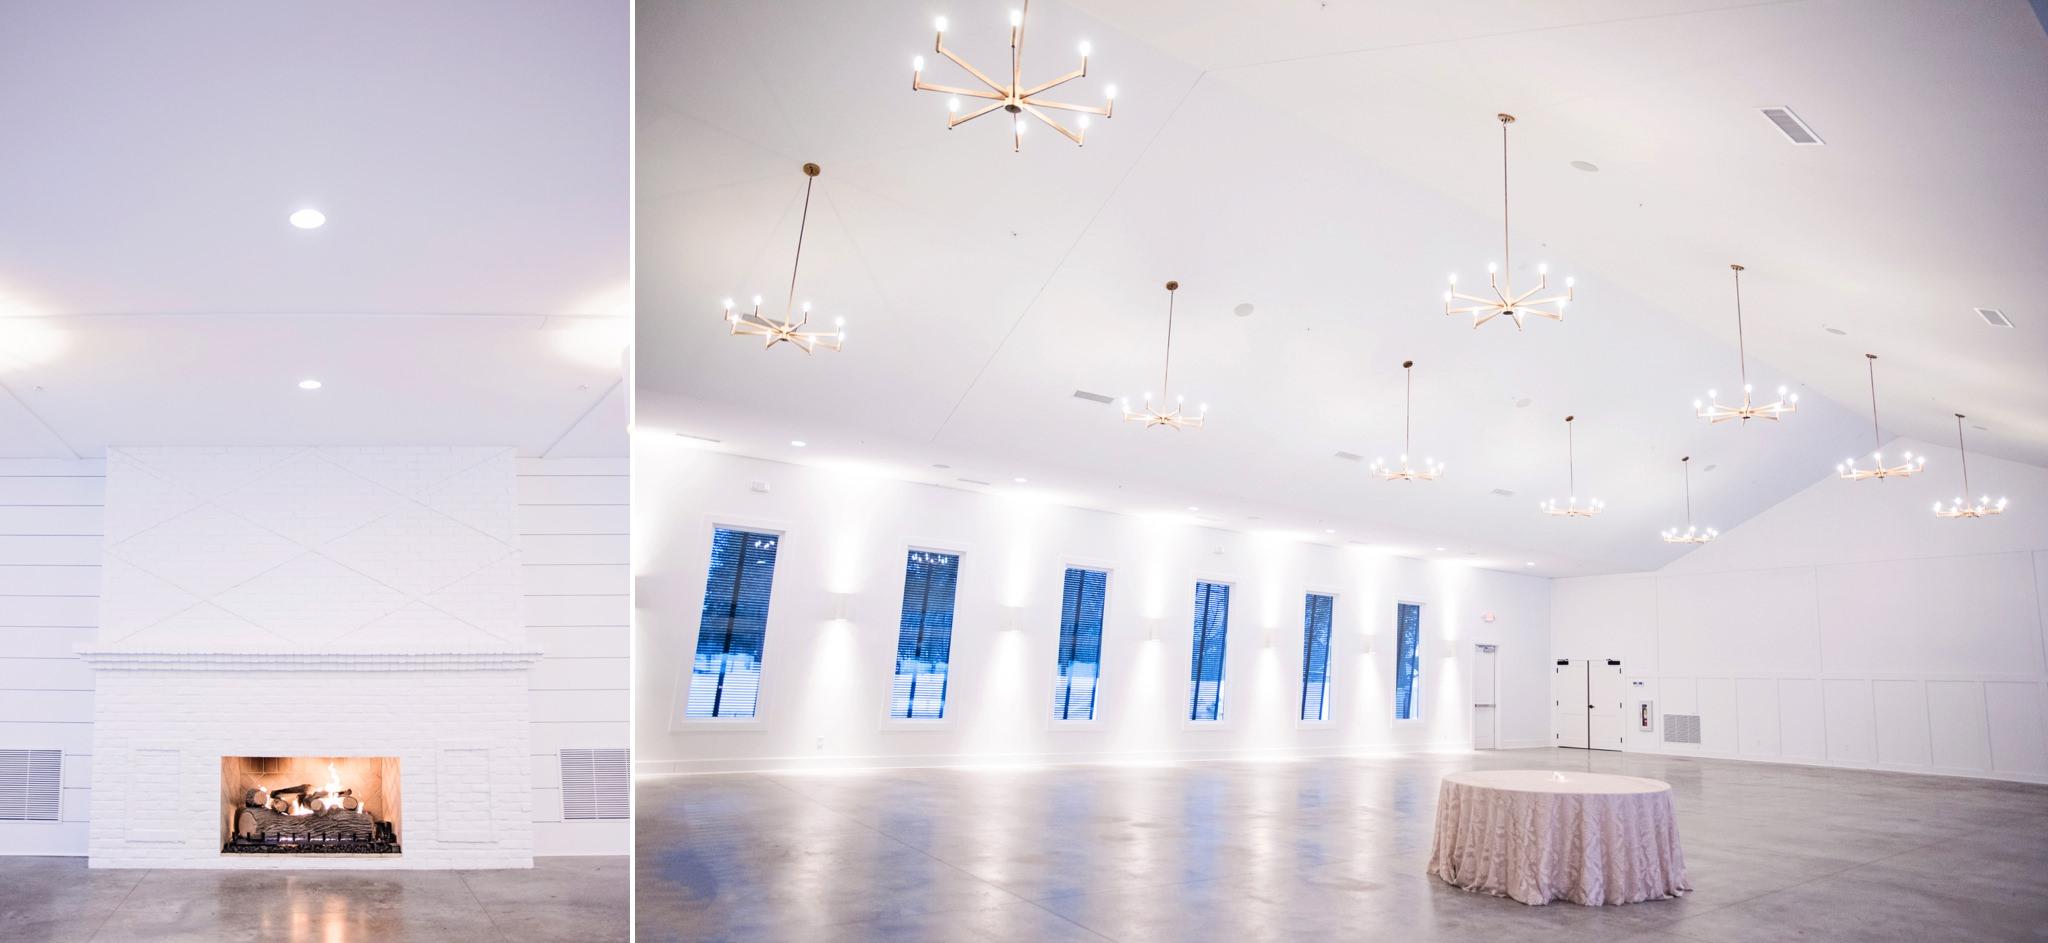 BLOG-Hutton-House-Minneapolis-Wedding-Venue-Rotella-Photography-_0035.jpg